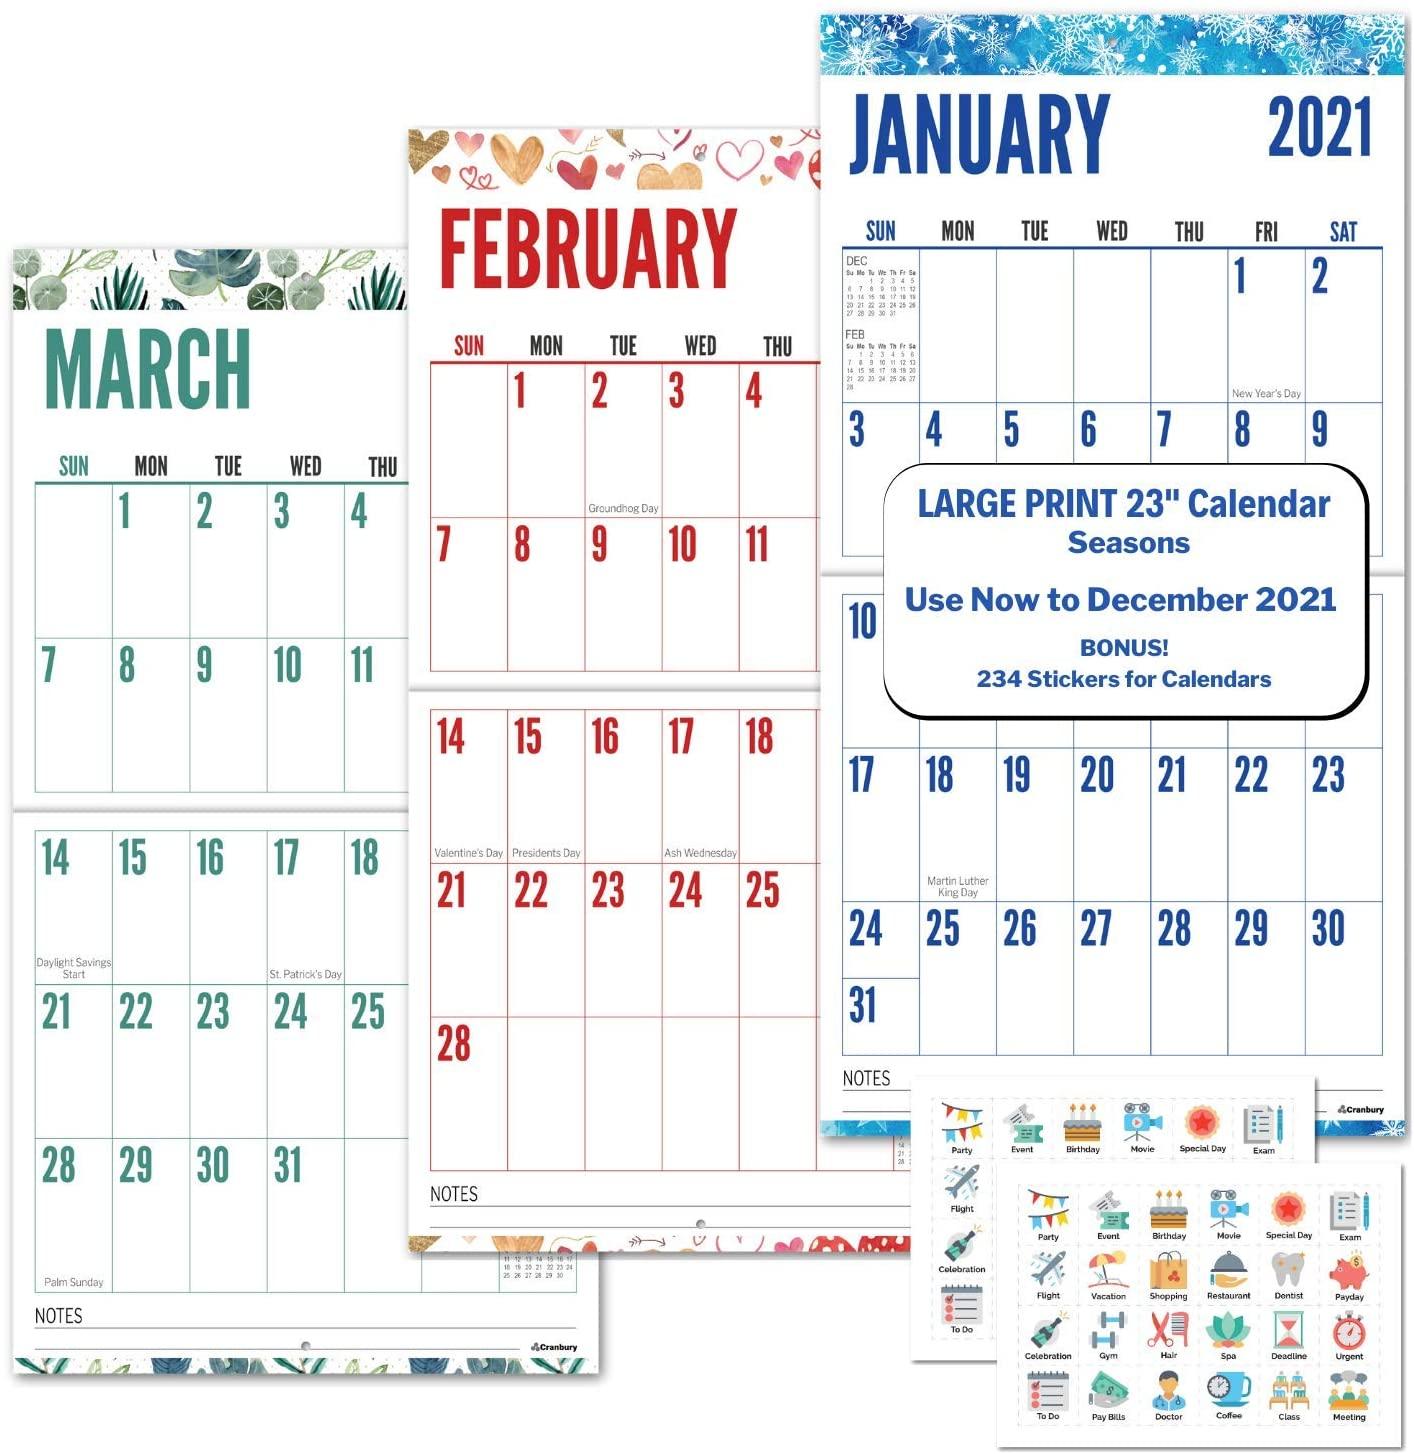 CRANBURY Large Print 2021 Wall Calendar (Seasons), 12x23, Use to December 2021, Stunning Big Grid Wall Calendar for Seniors, Vivid Colors, Family or Office Hanging Calendar 2020 2021